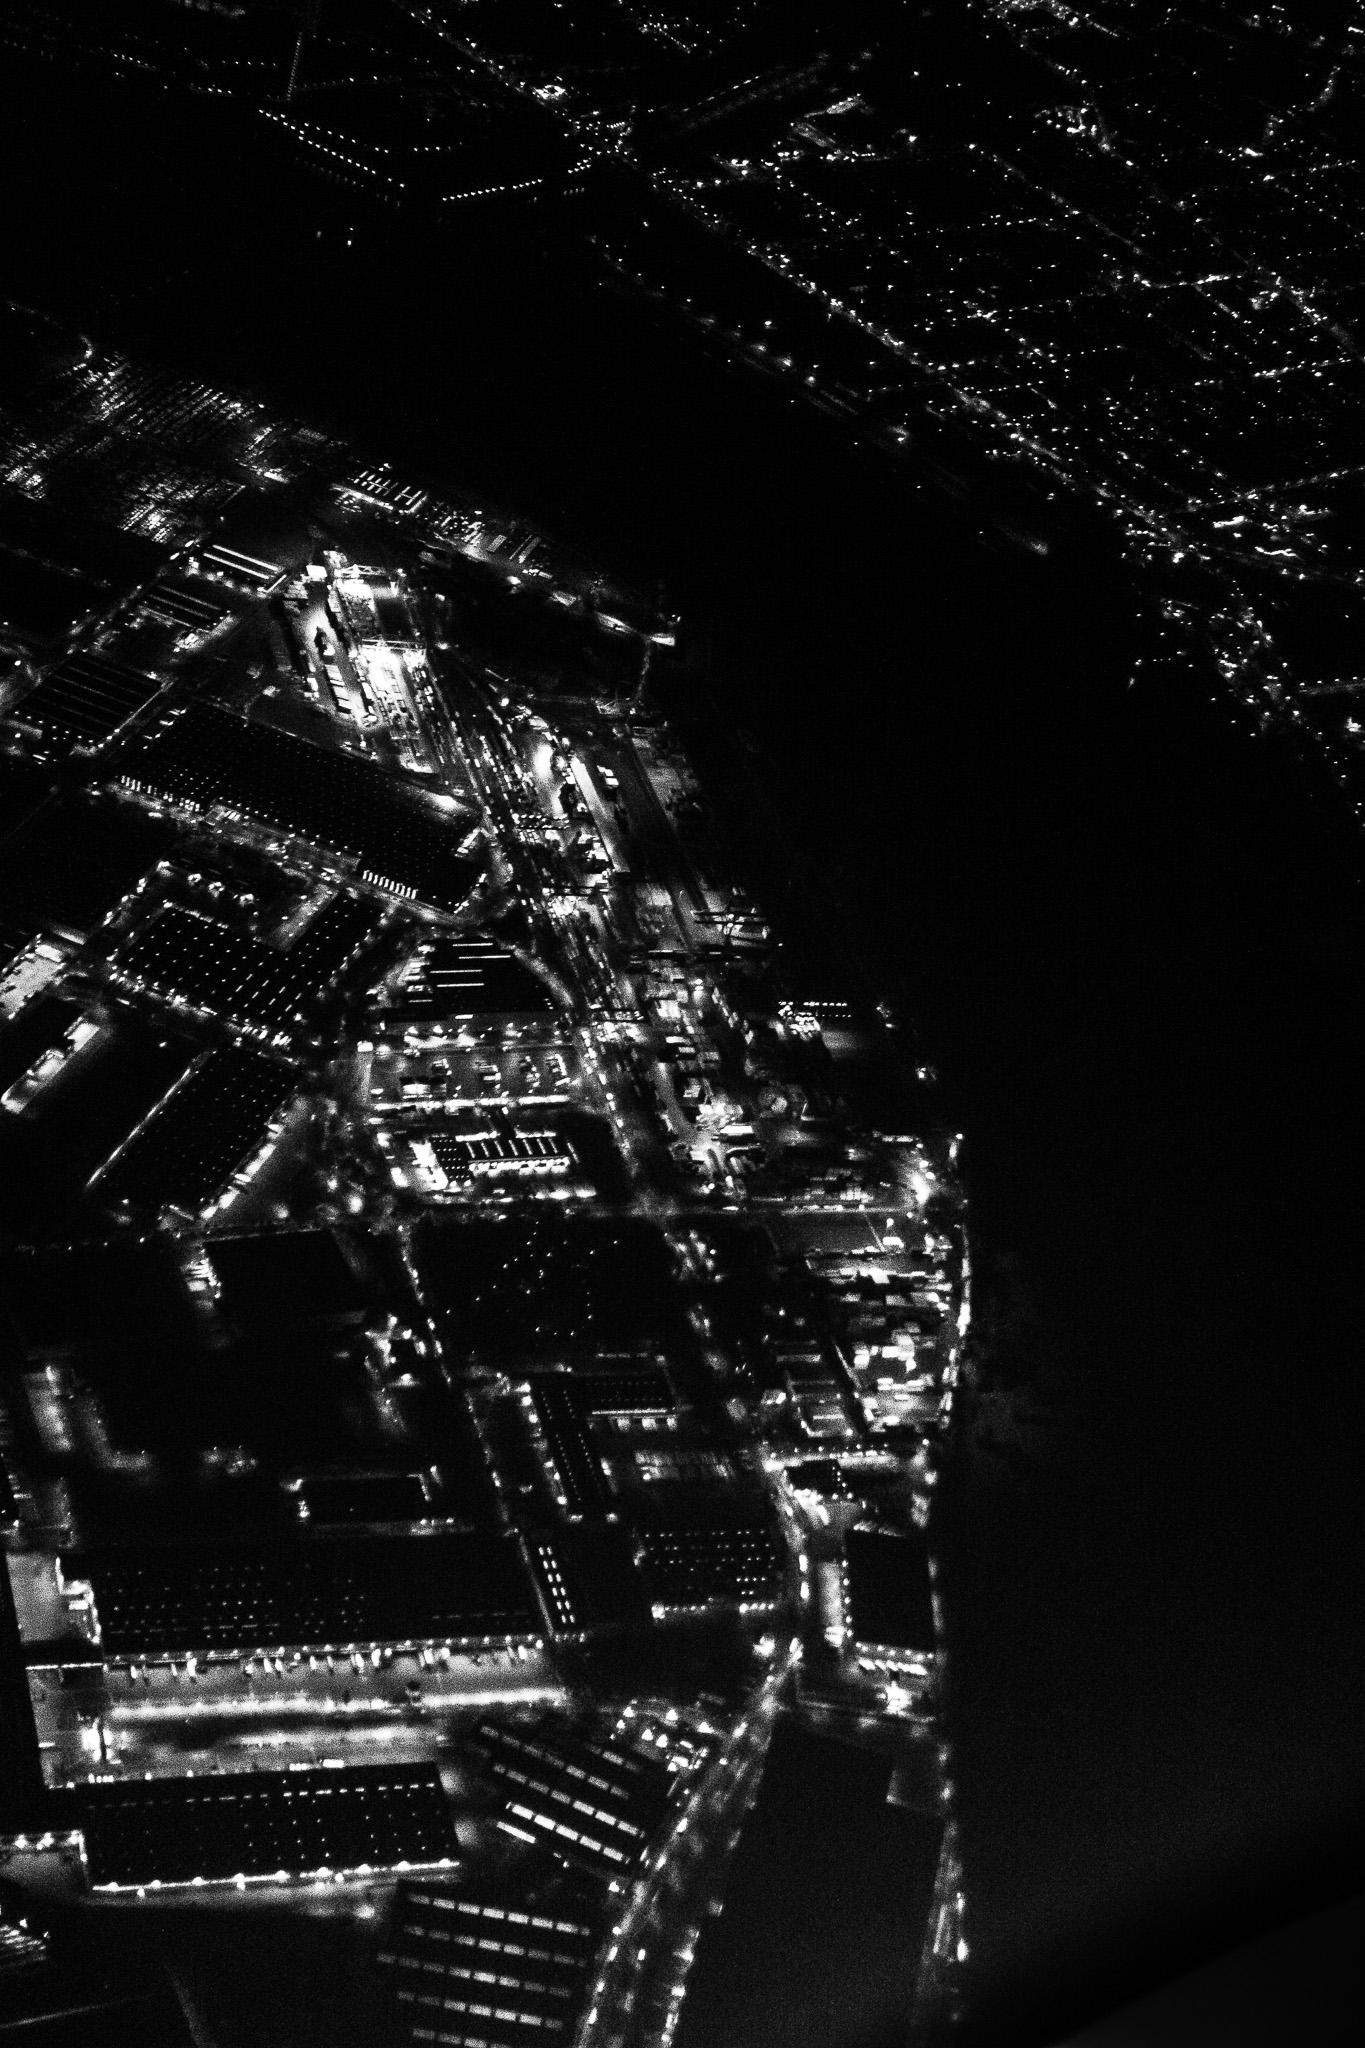 Vol de Nuit (13 von 16)